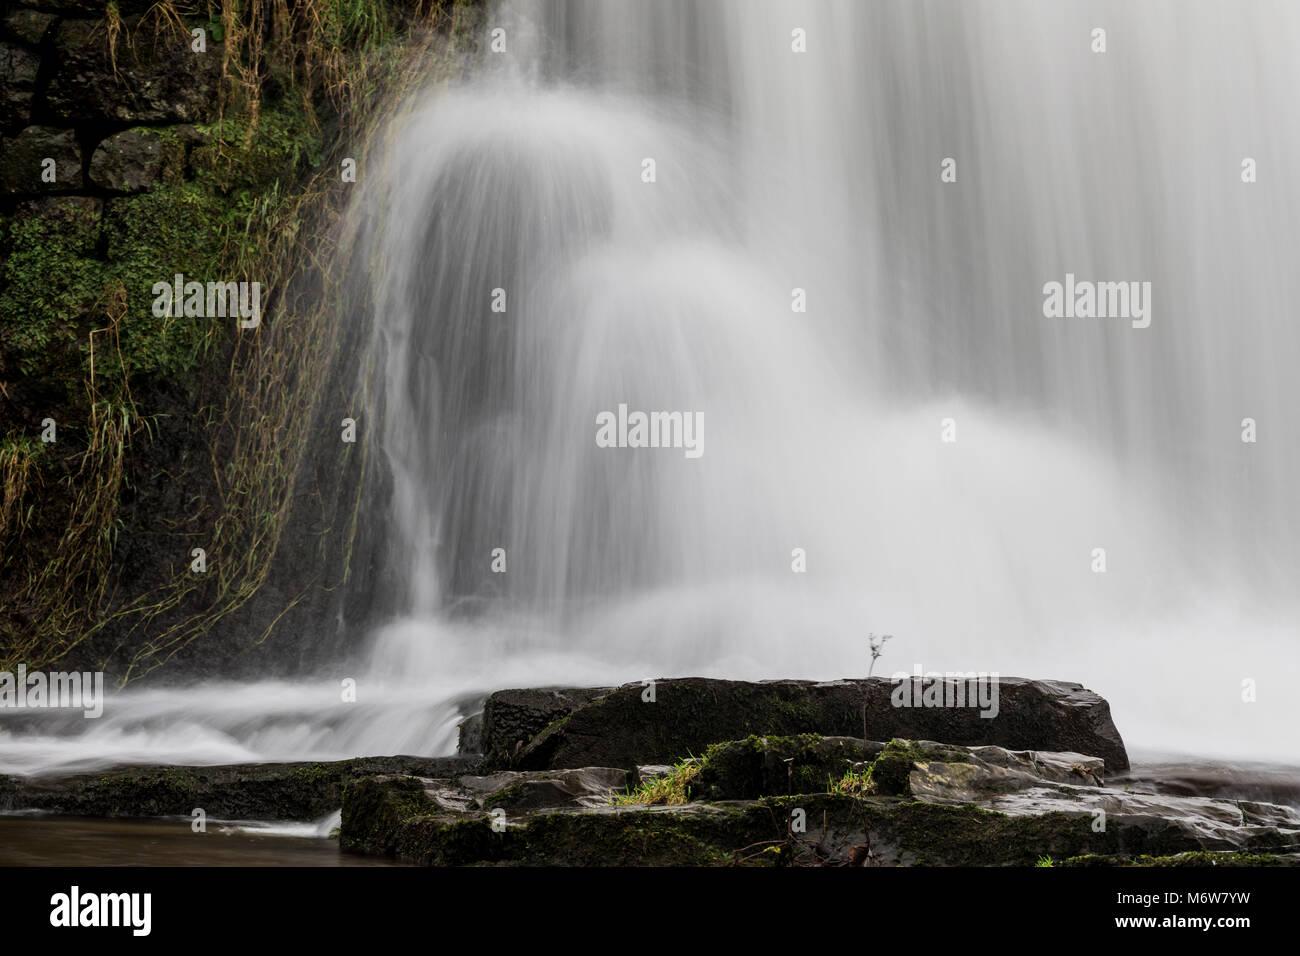 Bouncing waterfall - Stock Image